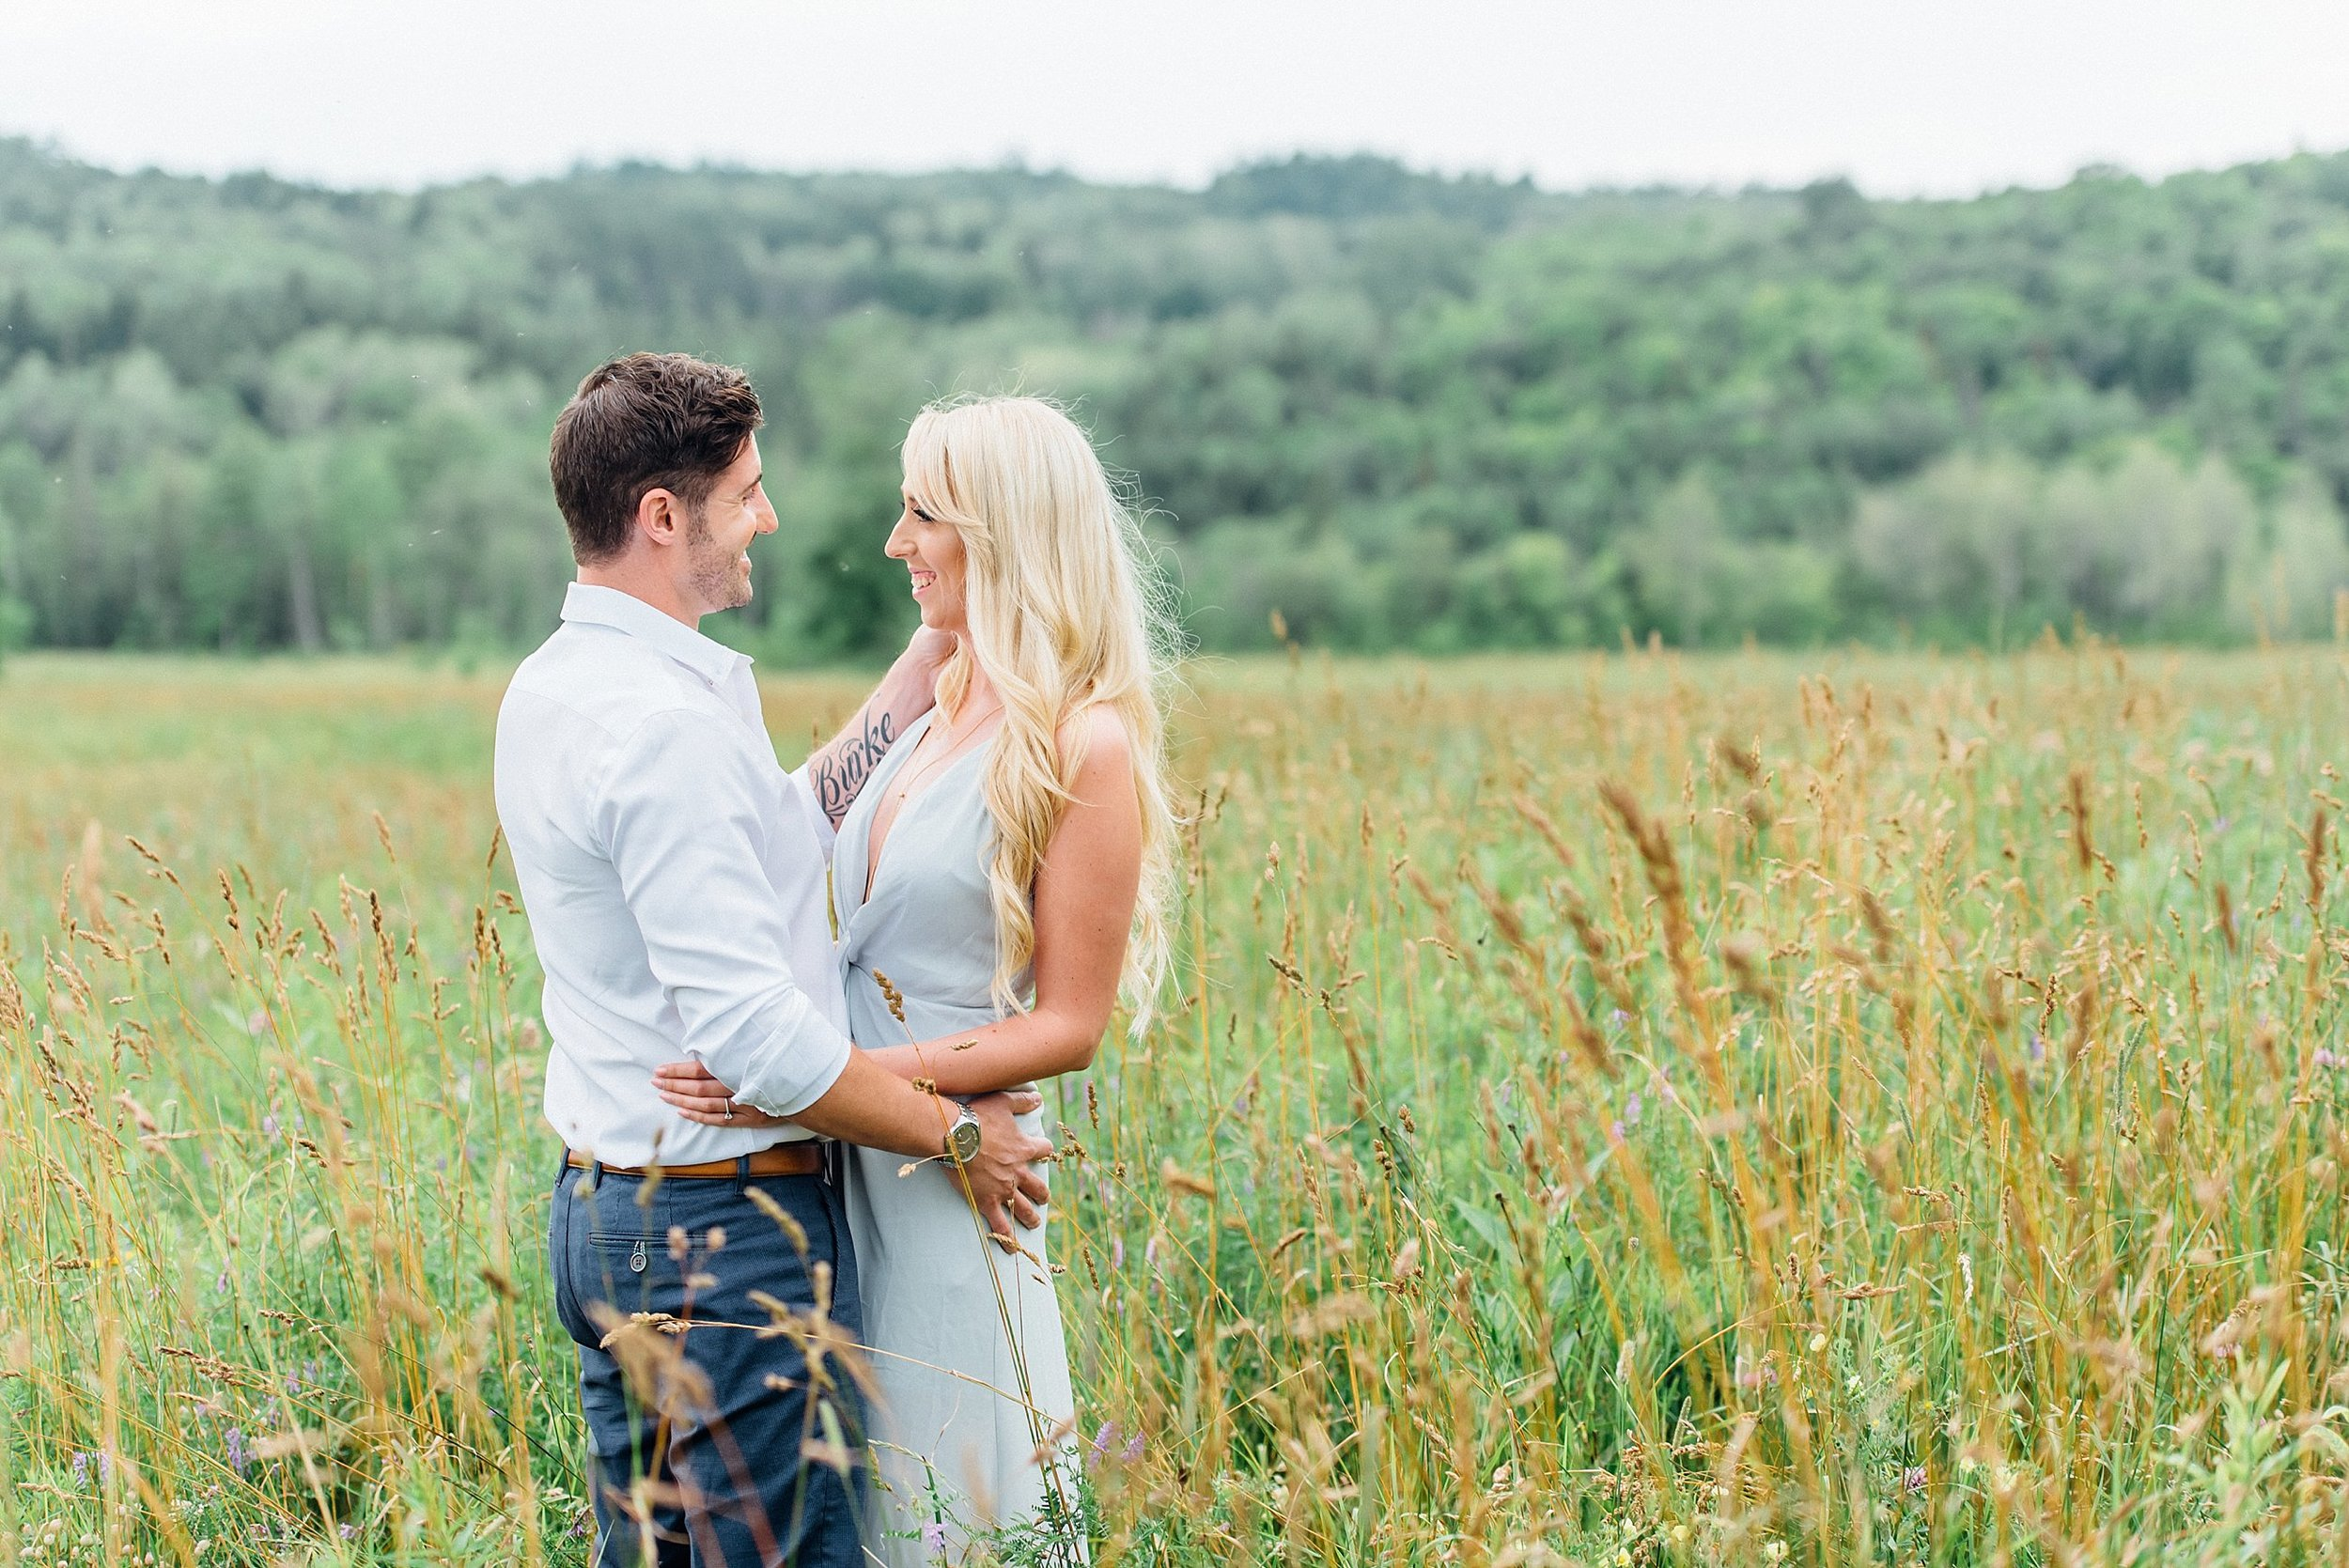 Ali and Batoul Photography - light, airy, indie documentary Ottawa wedding photographer_0007.jpg